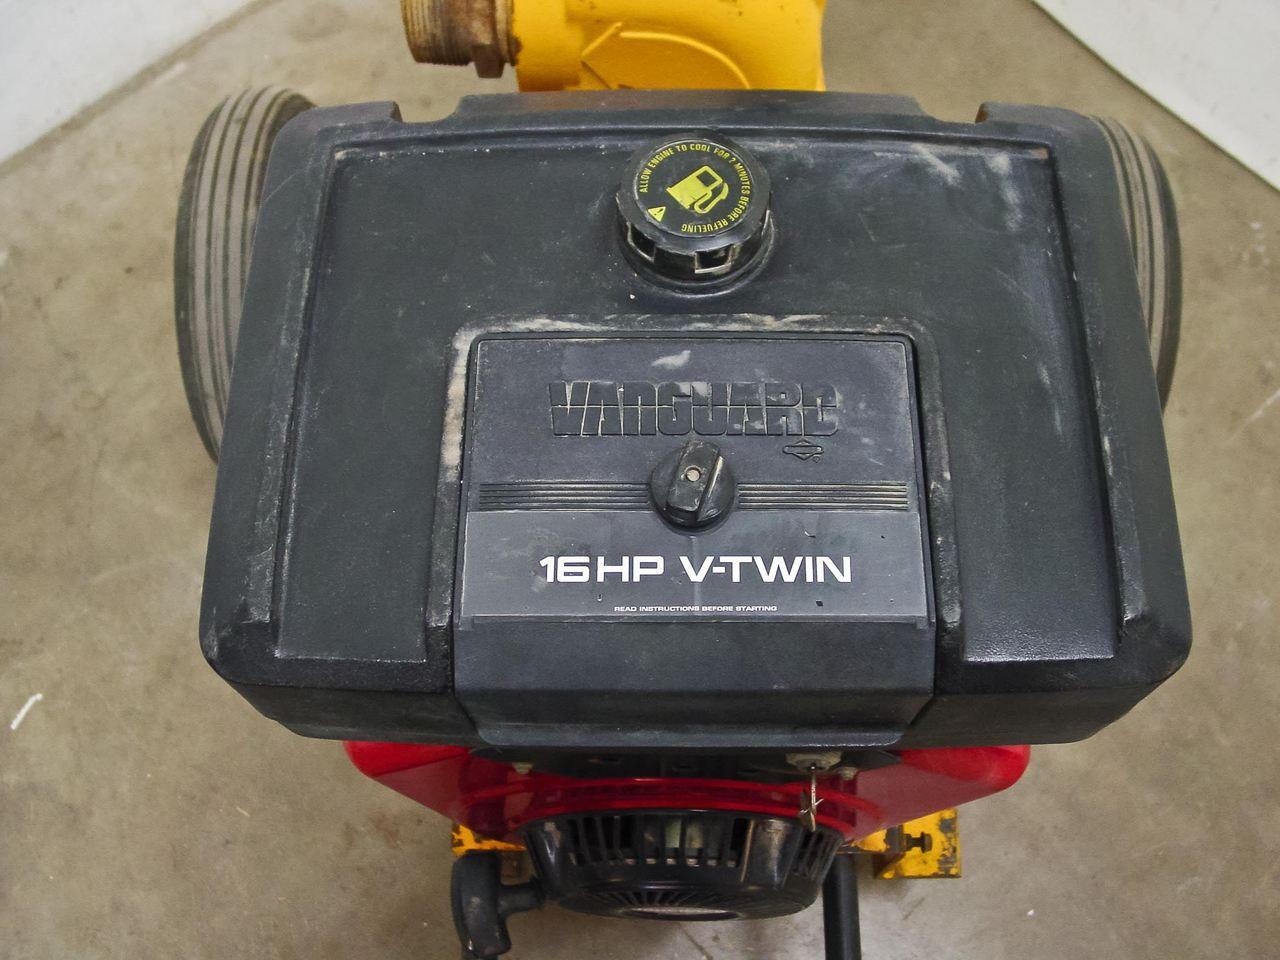 Teel 3P653 16 HP Trash Water Liquid Pump Vanguard Motor ...